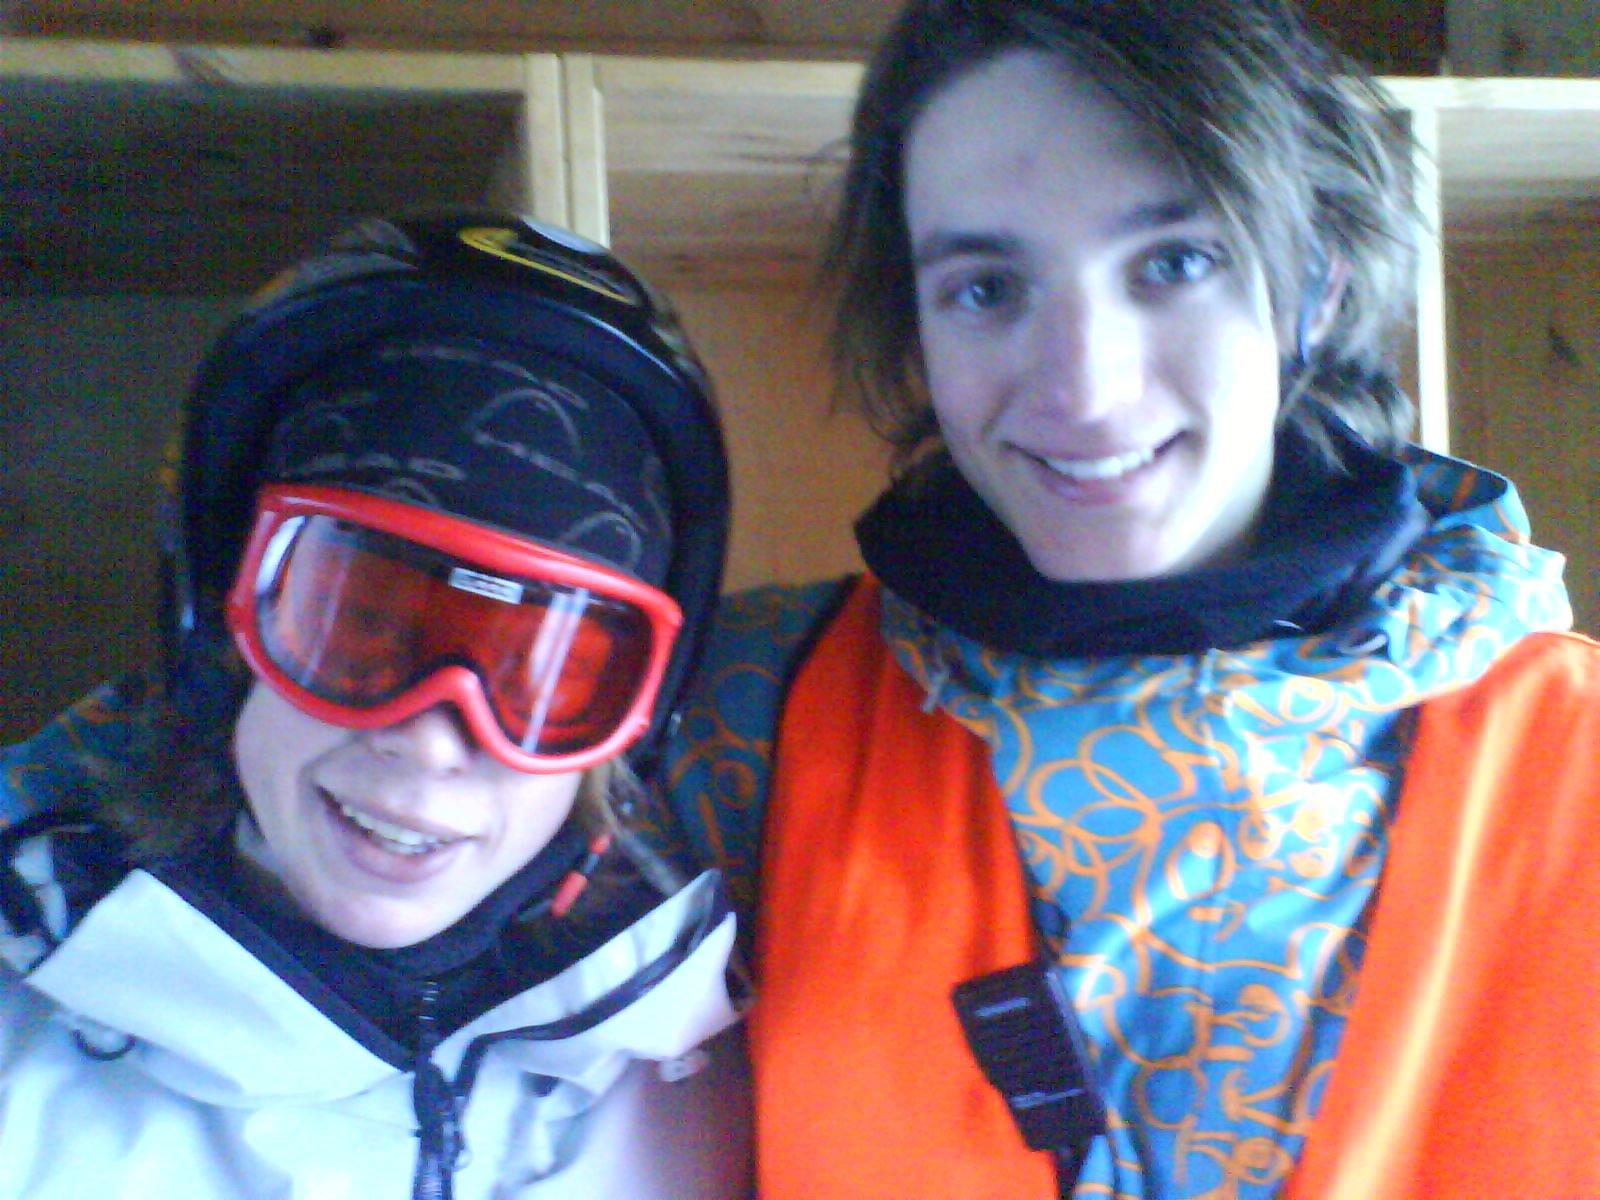 Olav and Mats